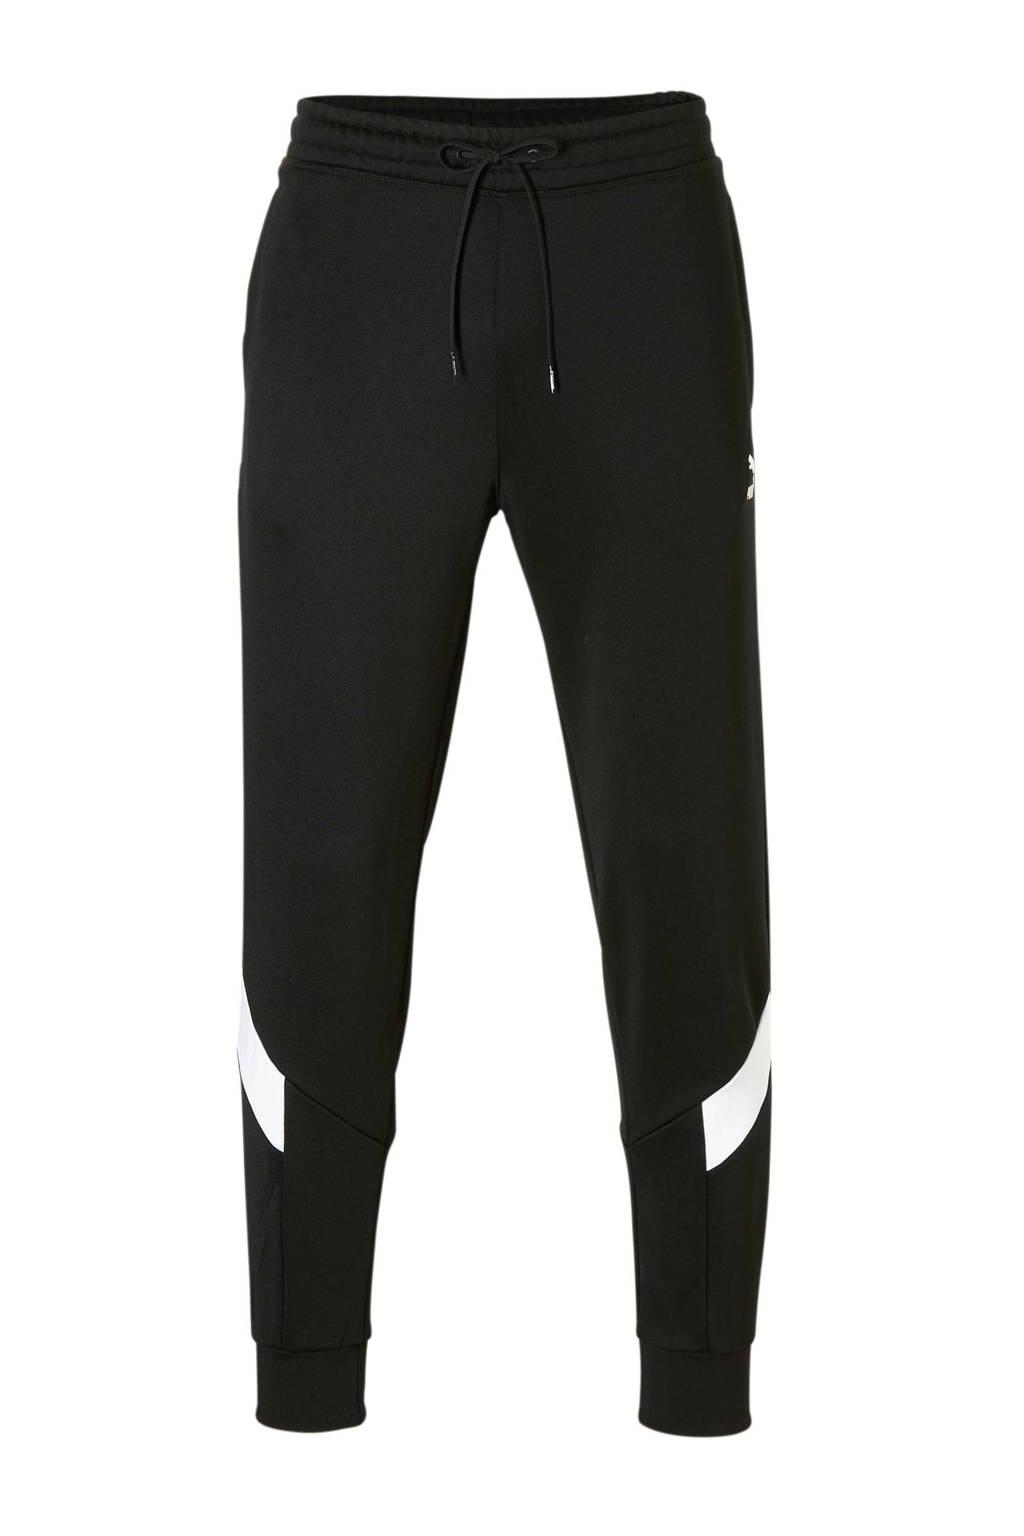 Puma   trainingsbroek zwart, Zwart/wit